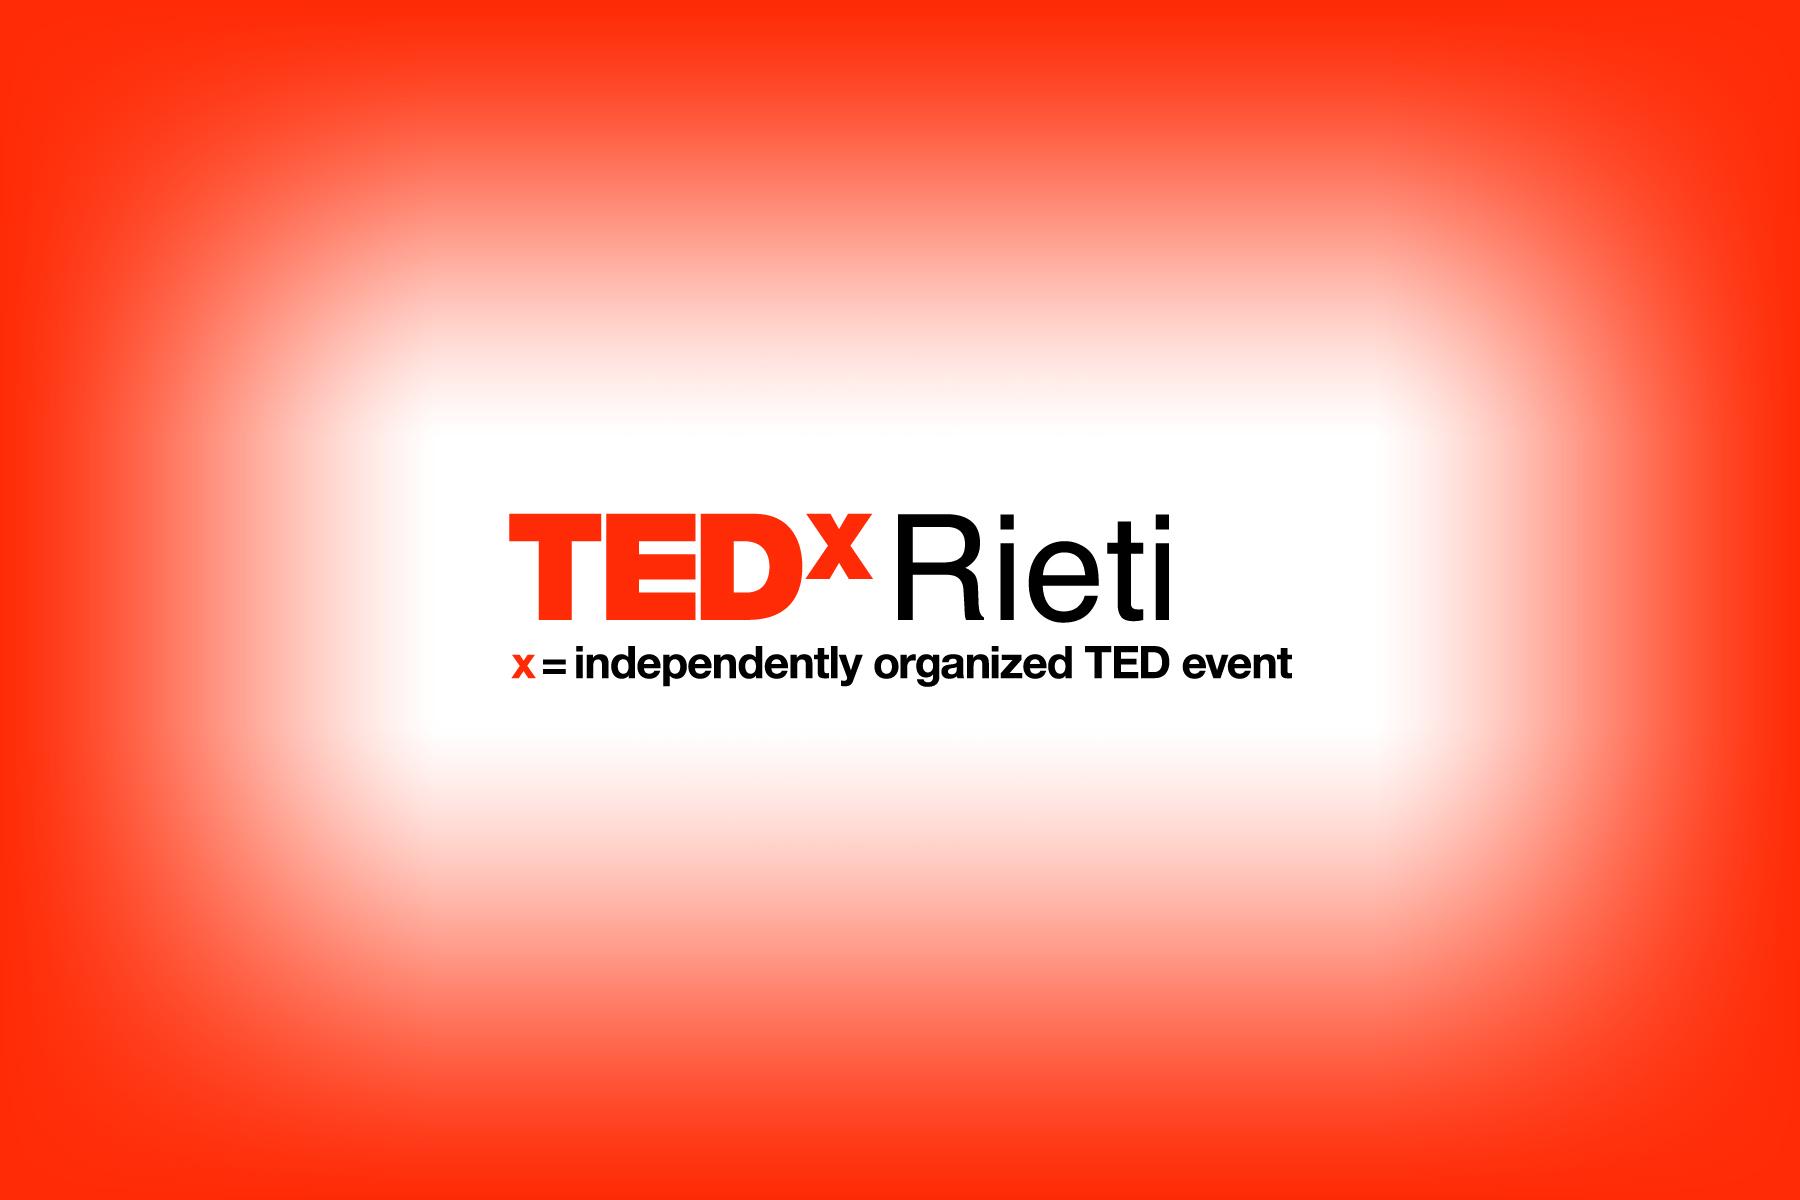 TEDxRieti